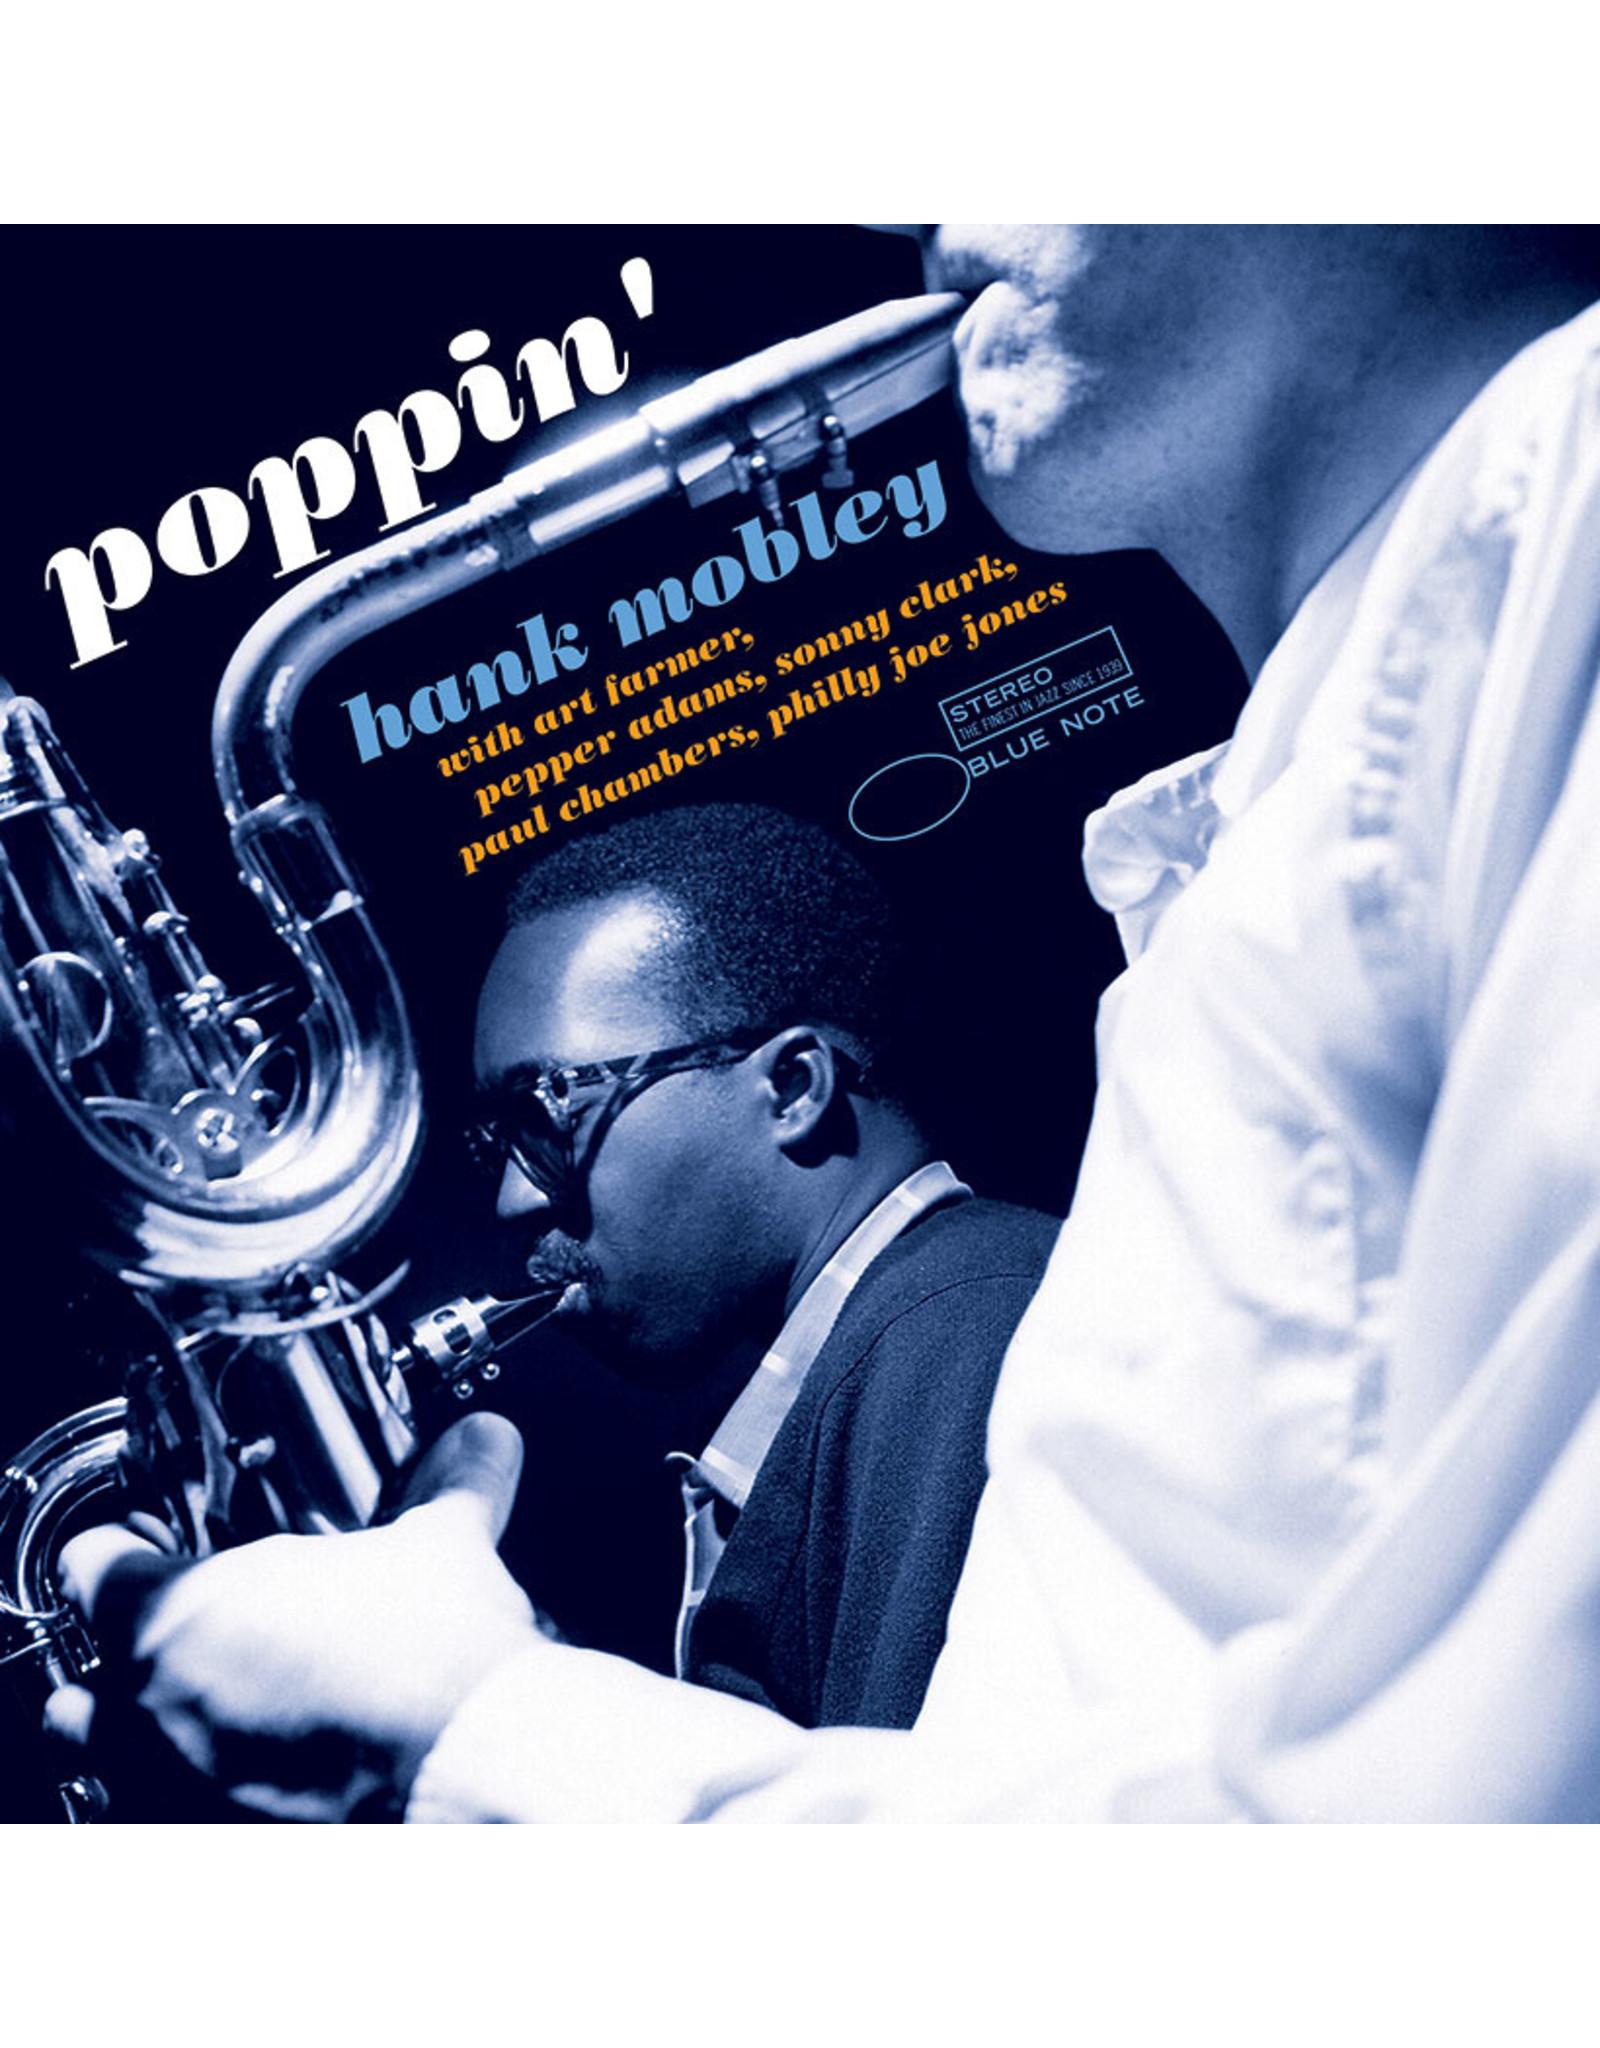 New Vinyl Hank Mobley - Poppin' LP